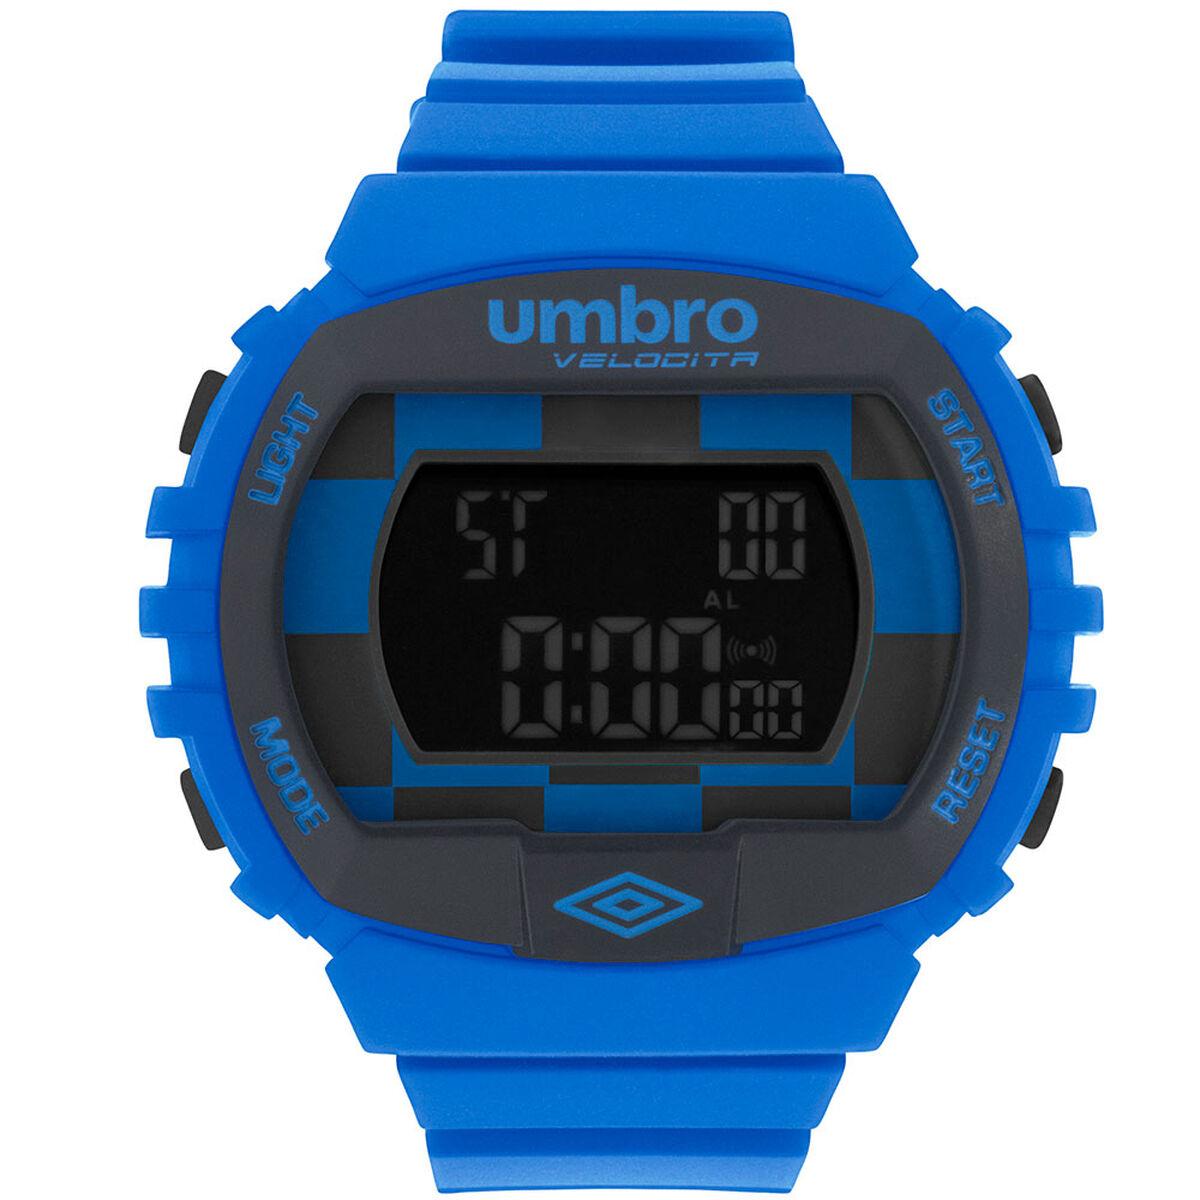 Reloj Digital Umbro UMB-067-3